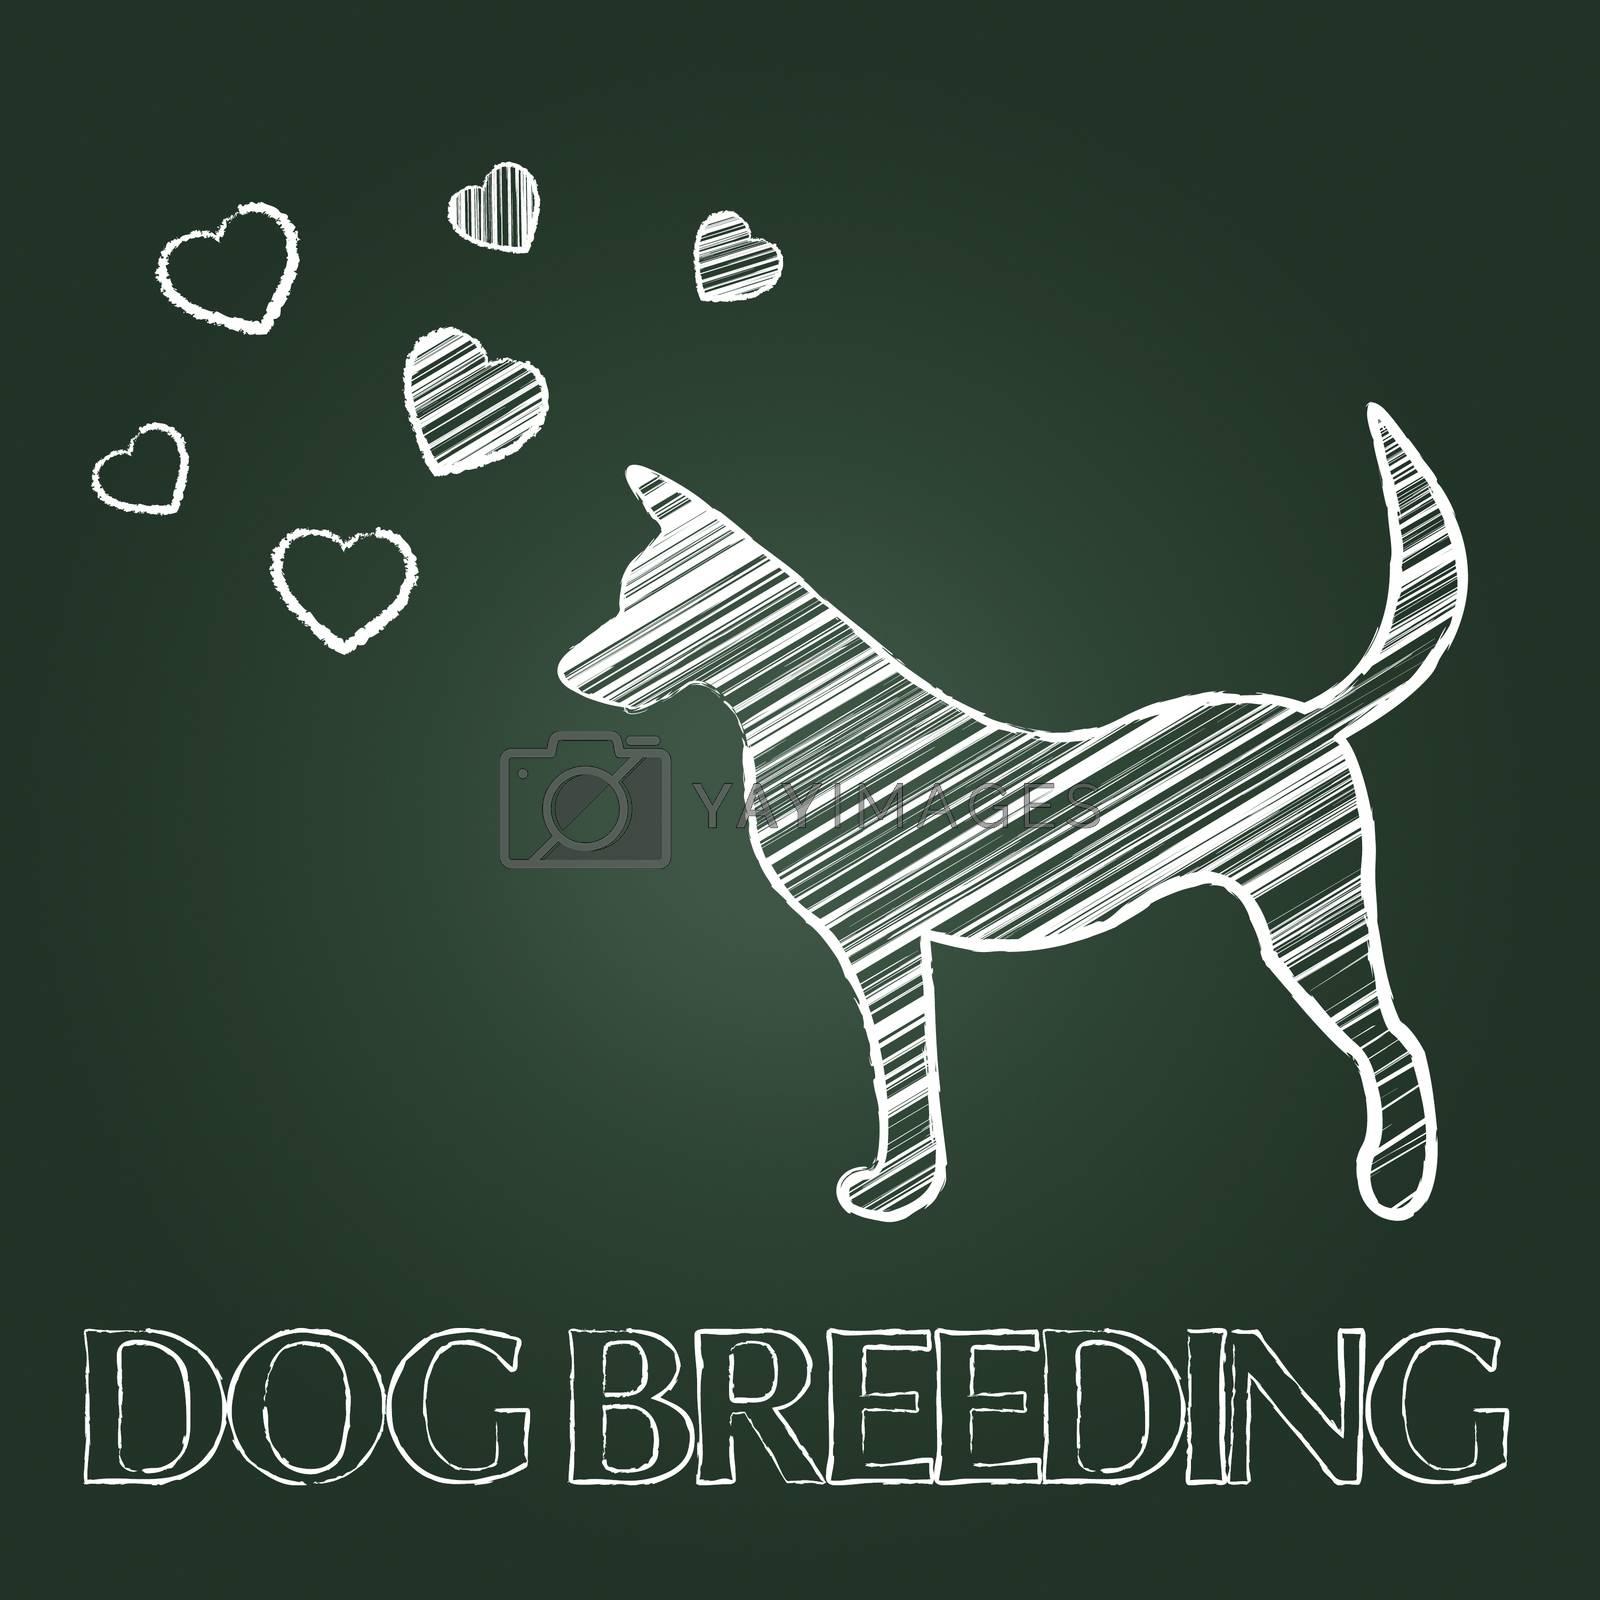 Dog Breeding Indicating Doggy Mate And Pedigree